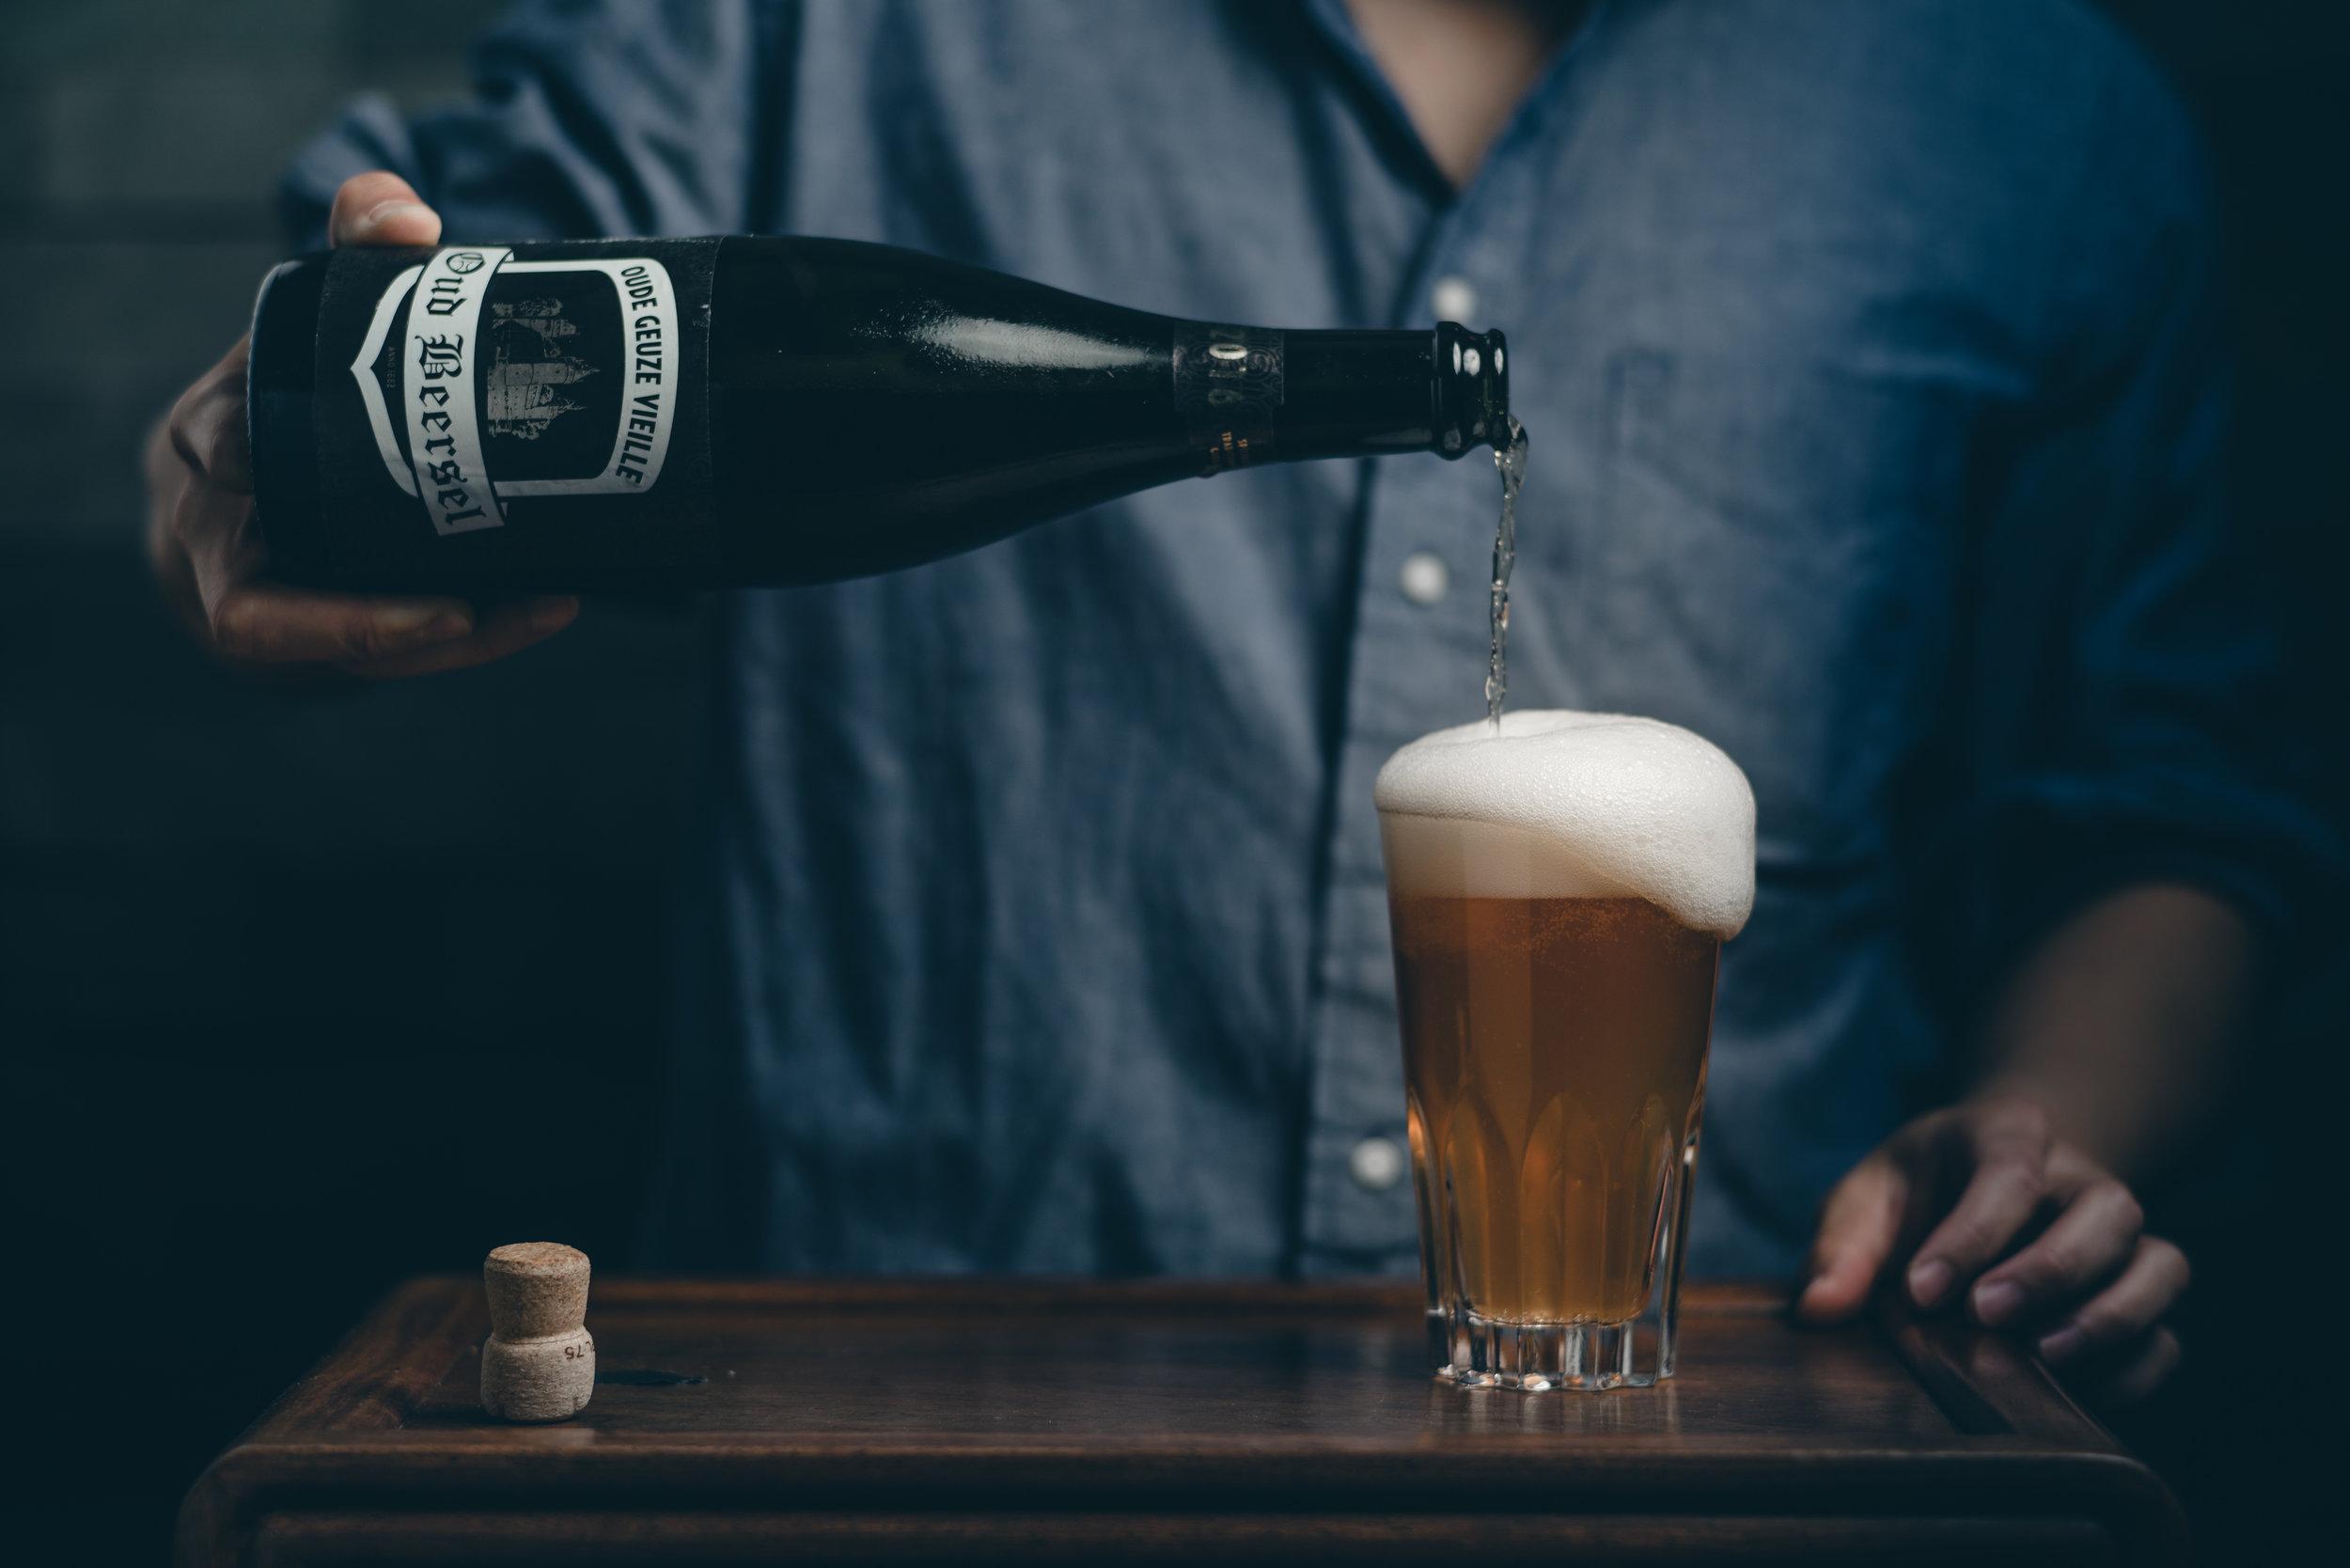 spontaneous fermentation hong kong craft beer bar Blue Supreme